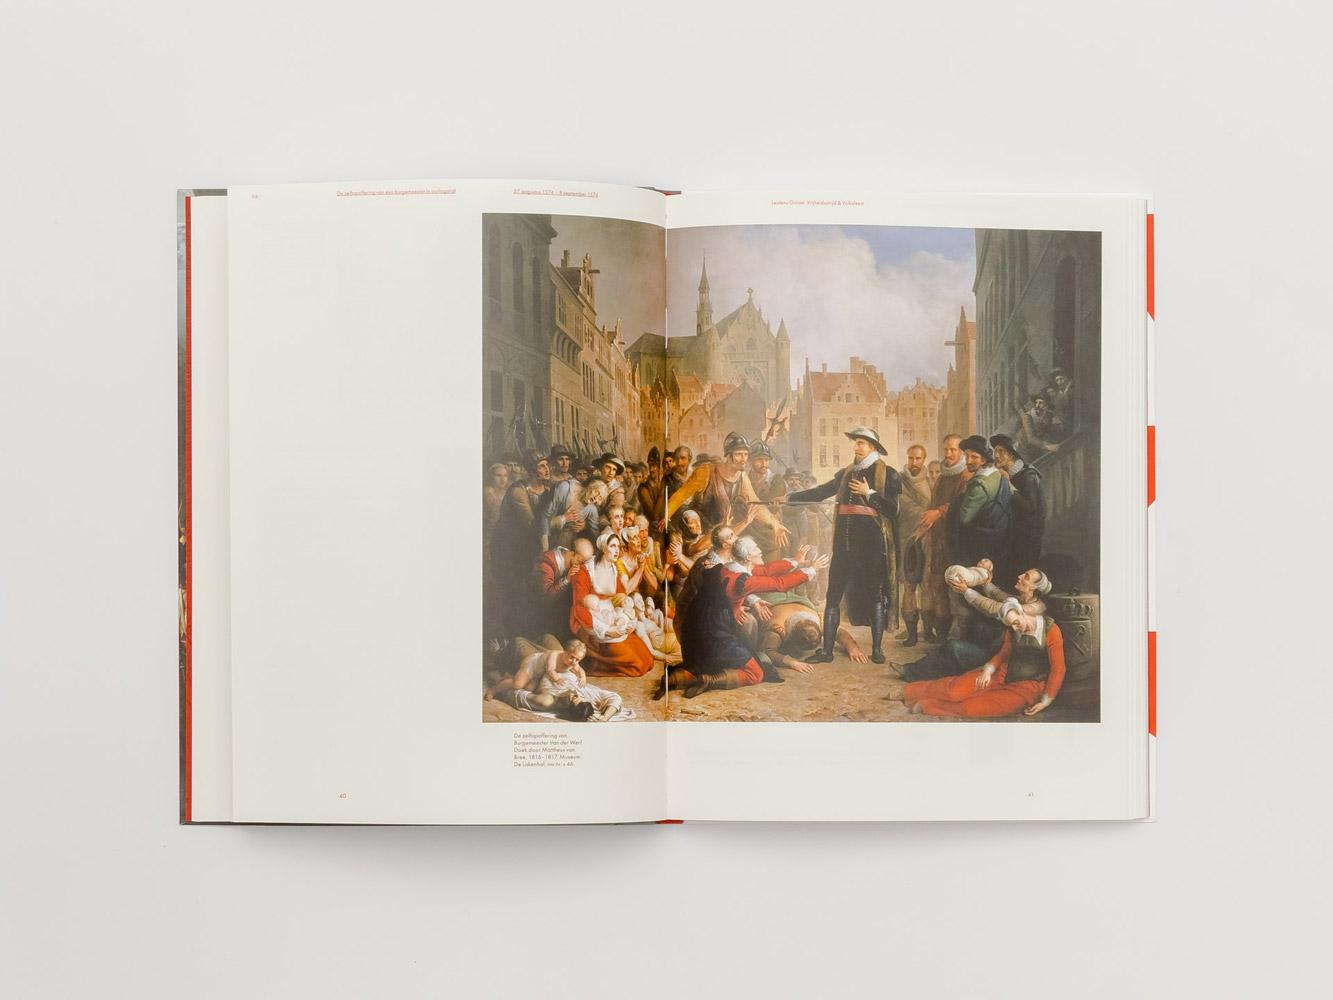 museum de lakenhal leidens ontzet publicatie nr 9 jpg